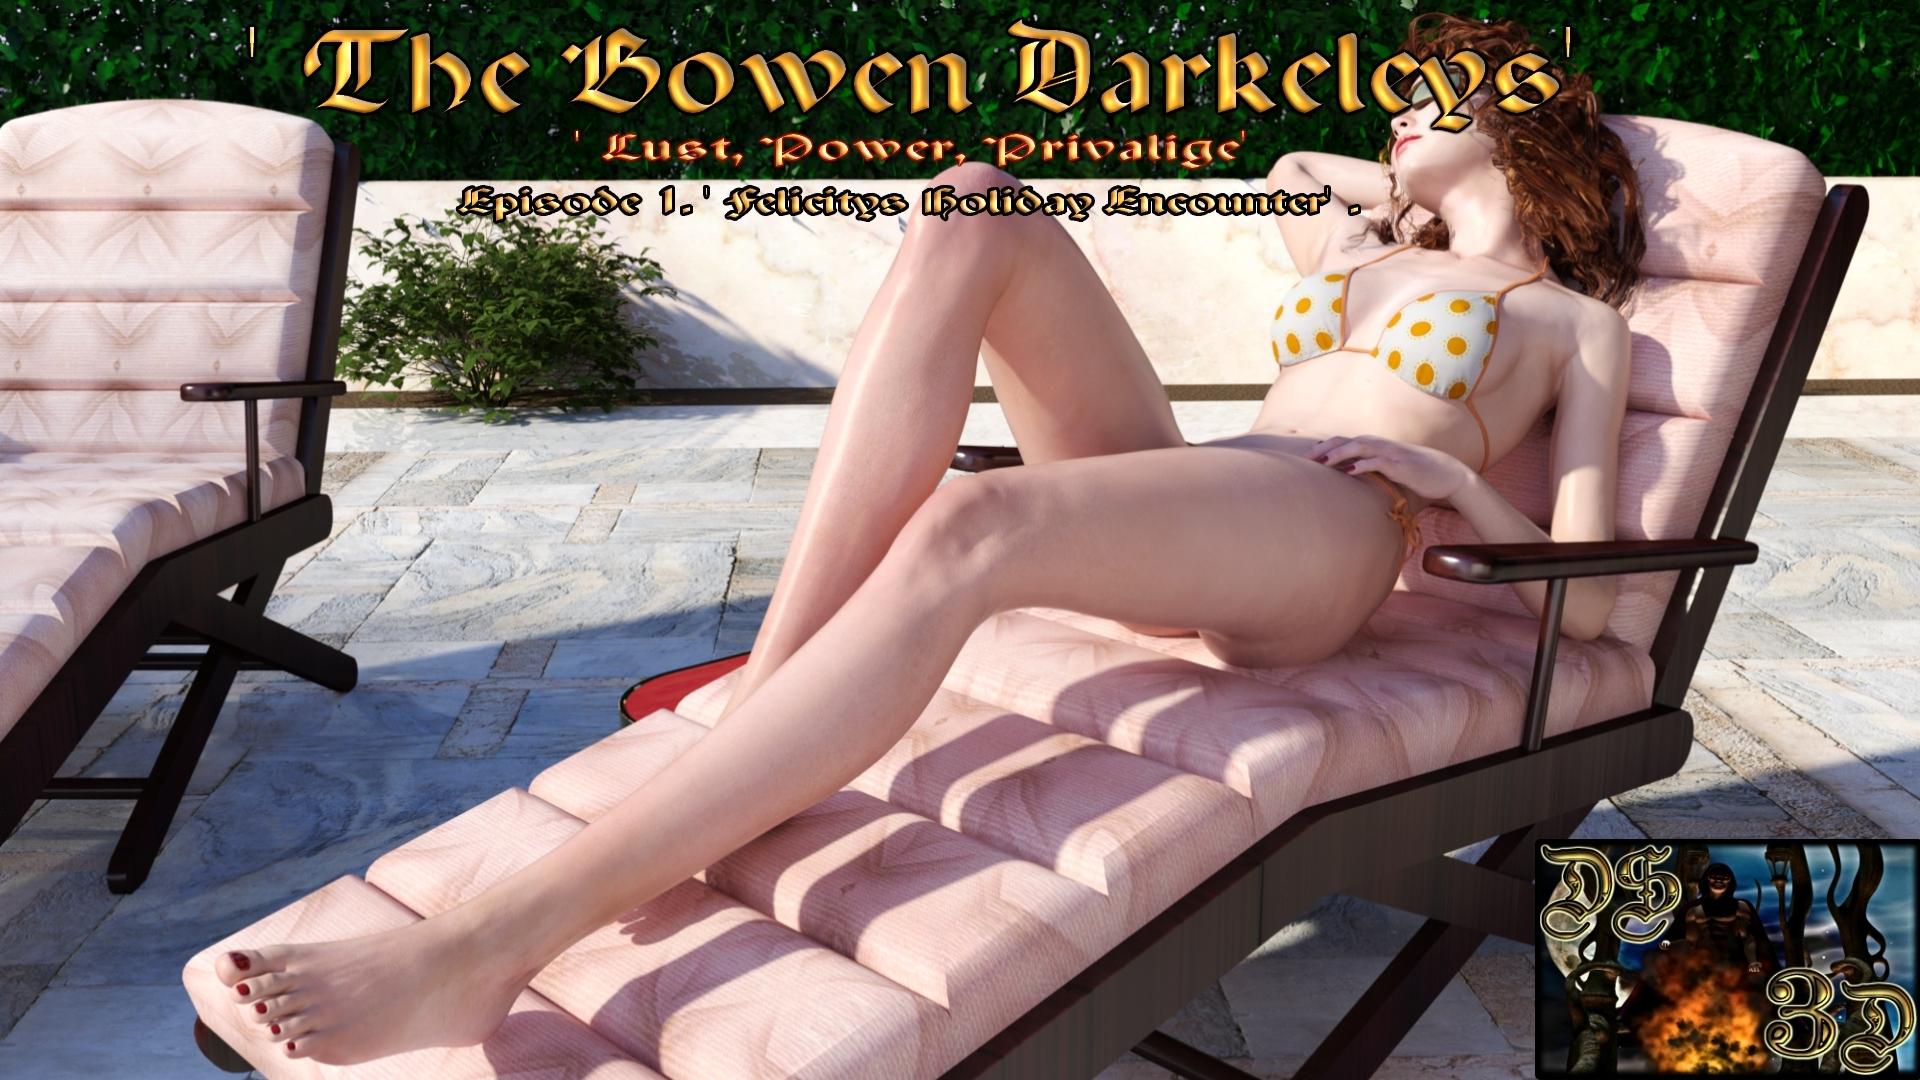 The Bowen-Darkeleys, Episode 1. Felicity's Holiday Encounter'.